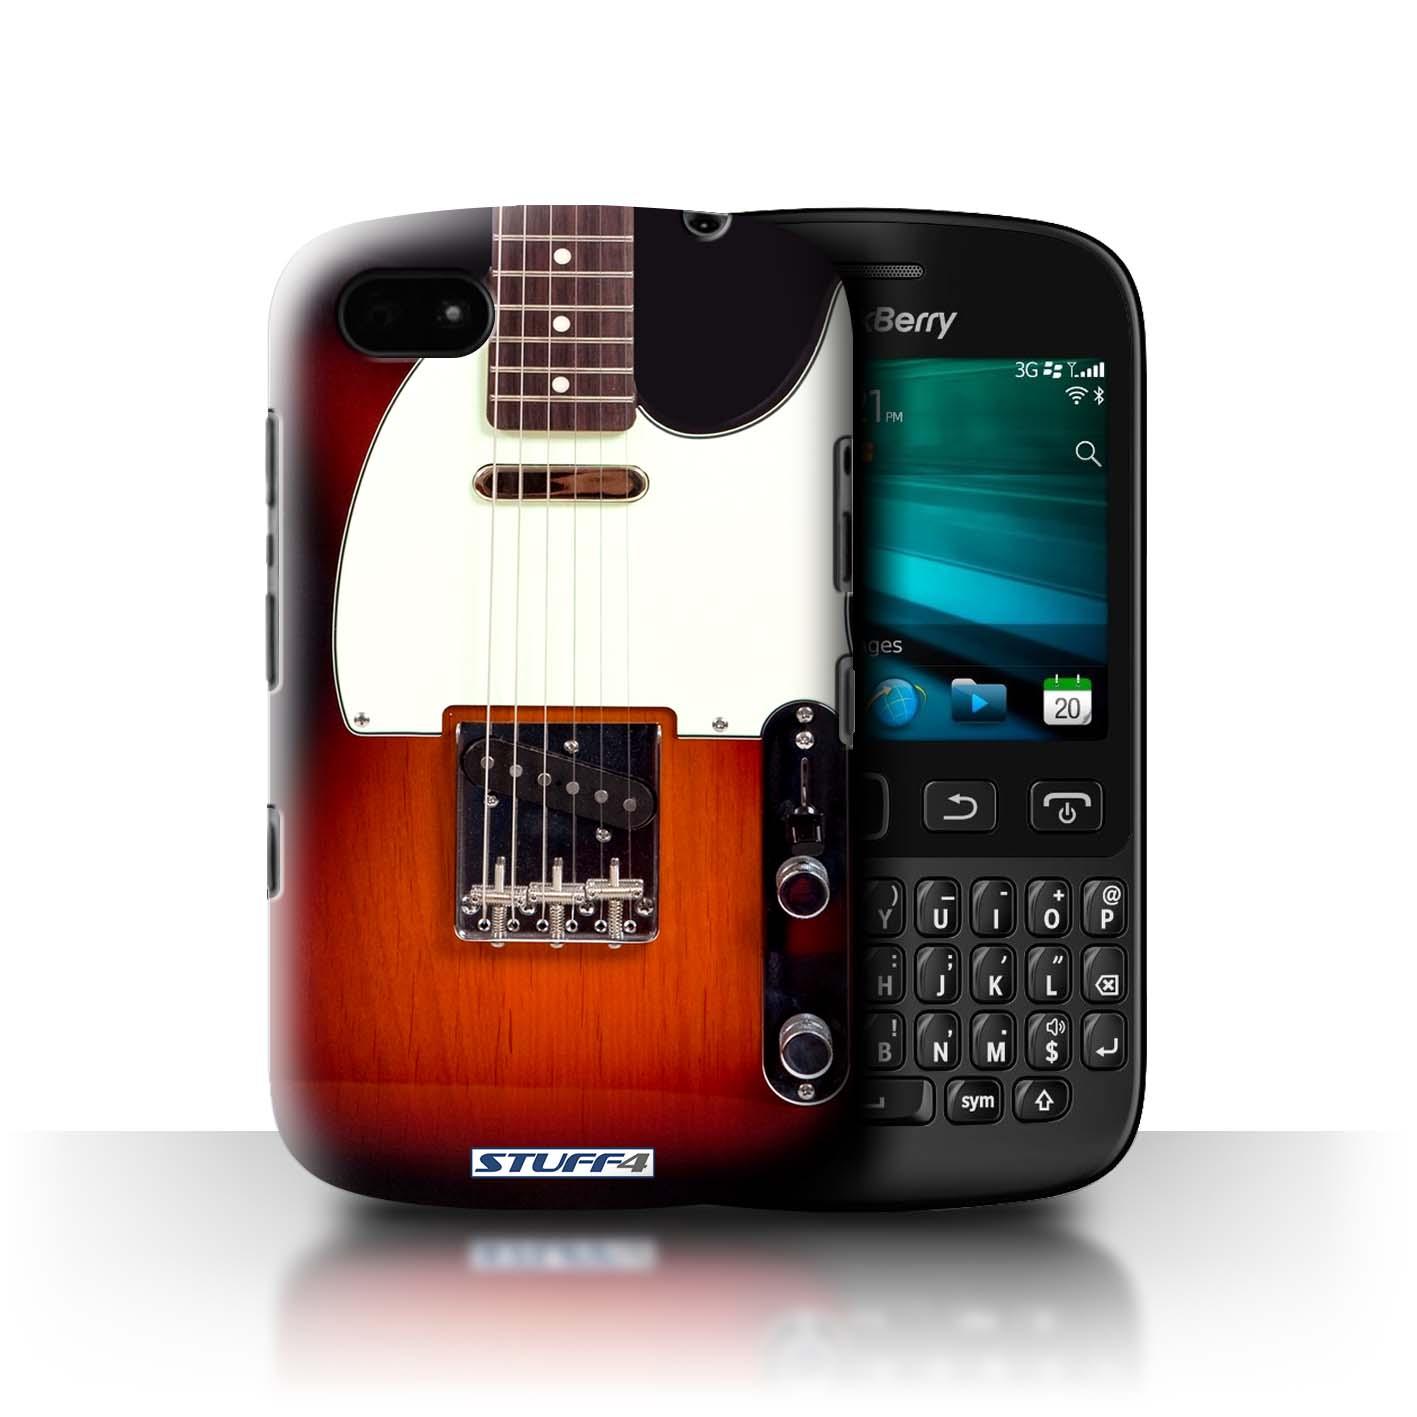 STUFF4-Coque-Etui-pour-Blackberry-Smartphone-Guitare-Protection-Housse